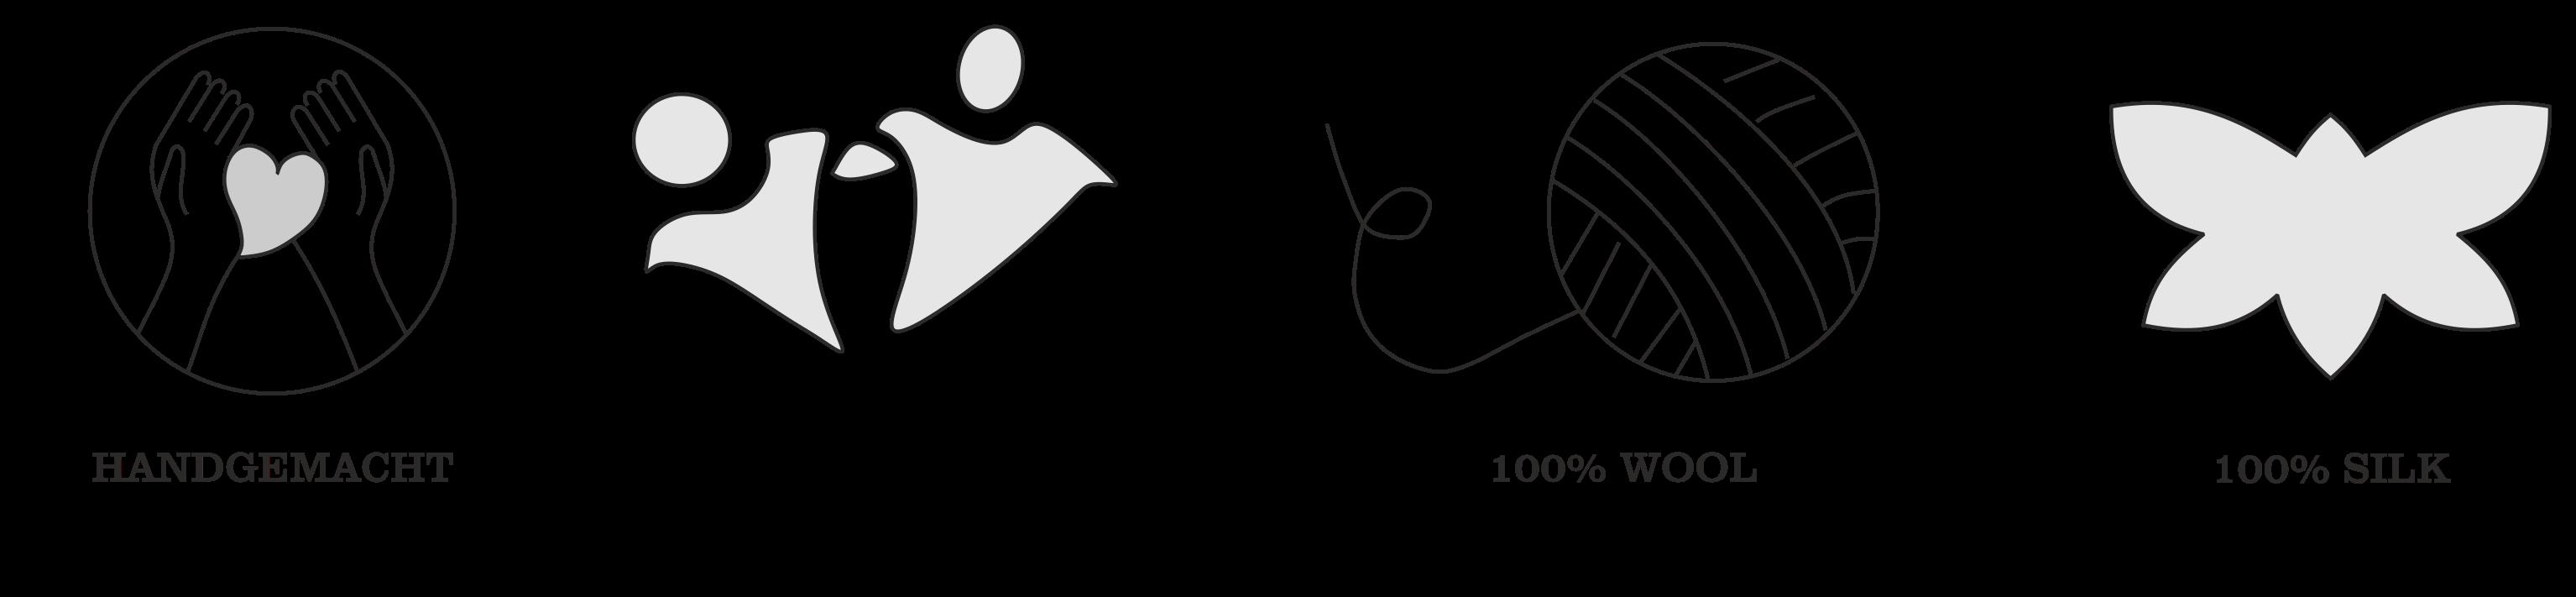 Kirgisische filzpantoffeln handgemacht fair hergestellt 100% wolle 100% seide